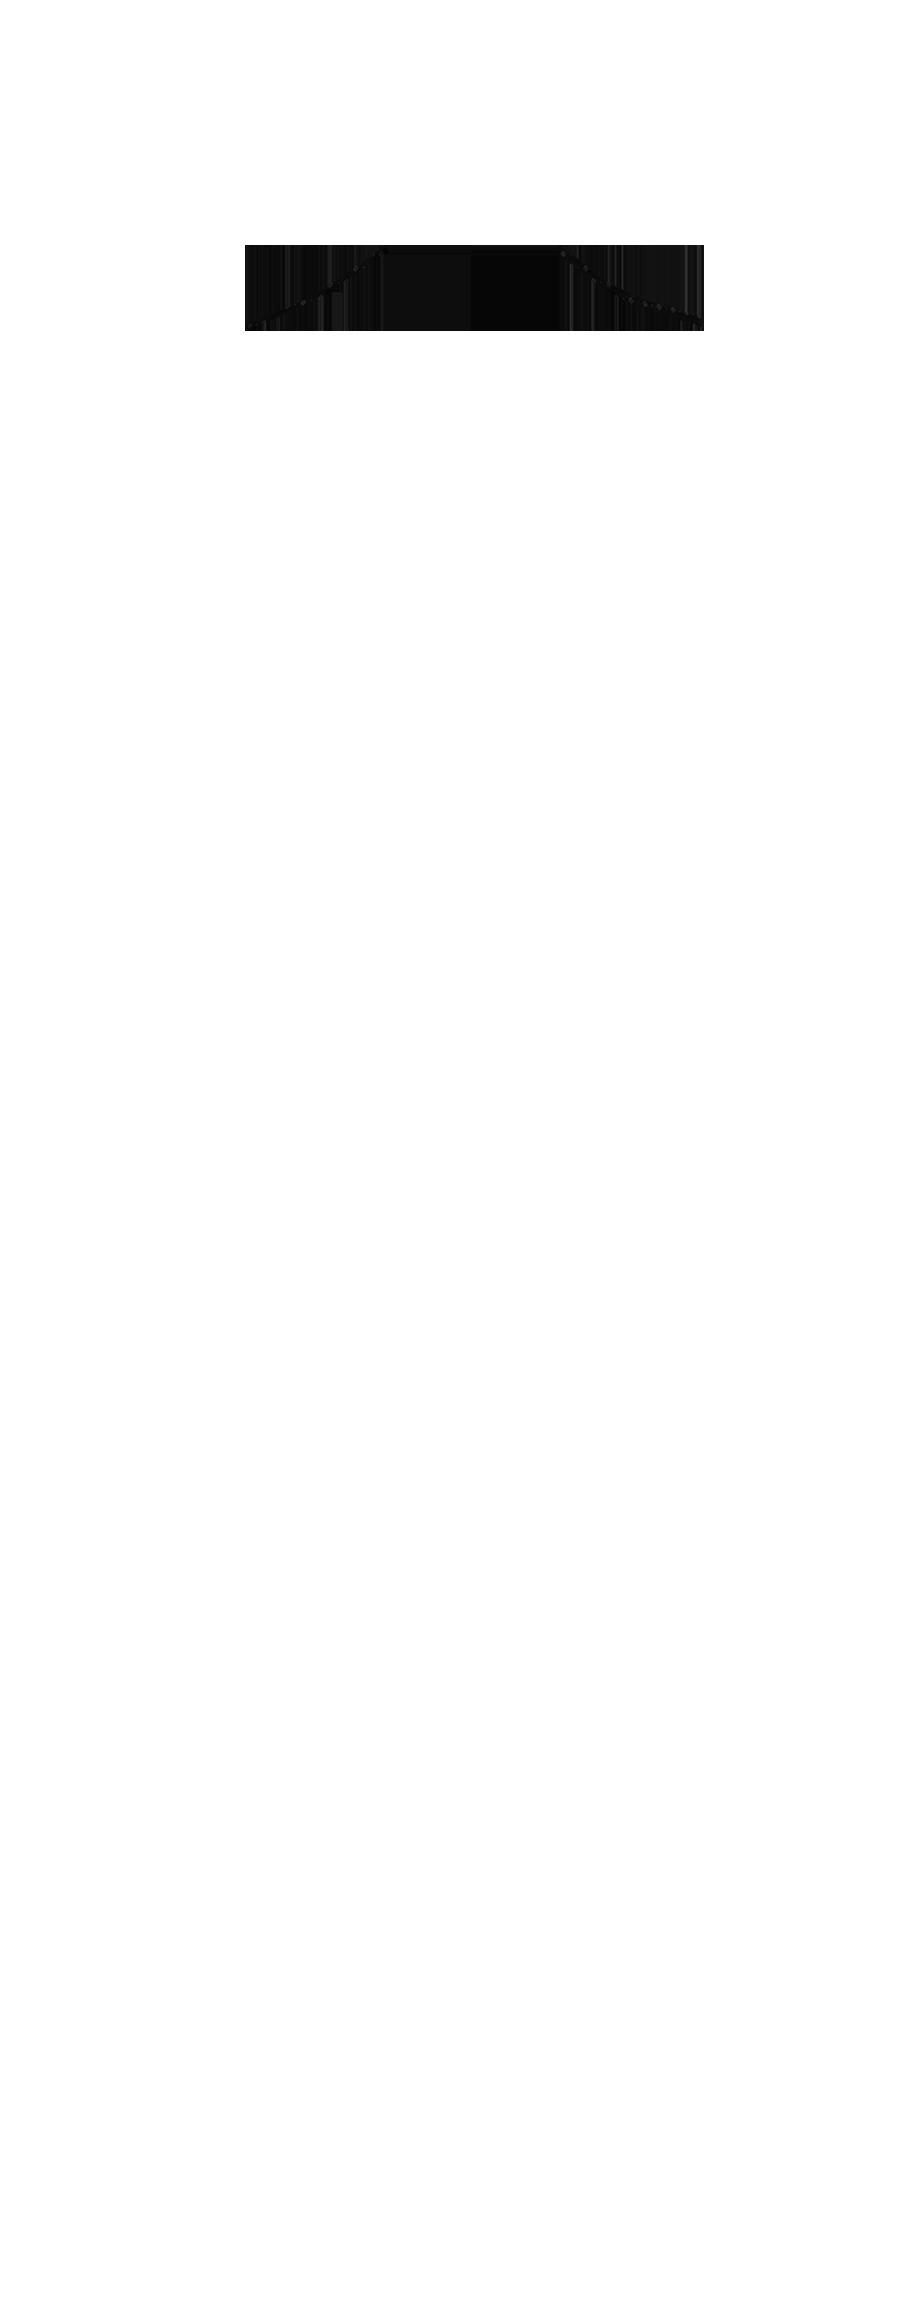 NEFL-12